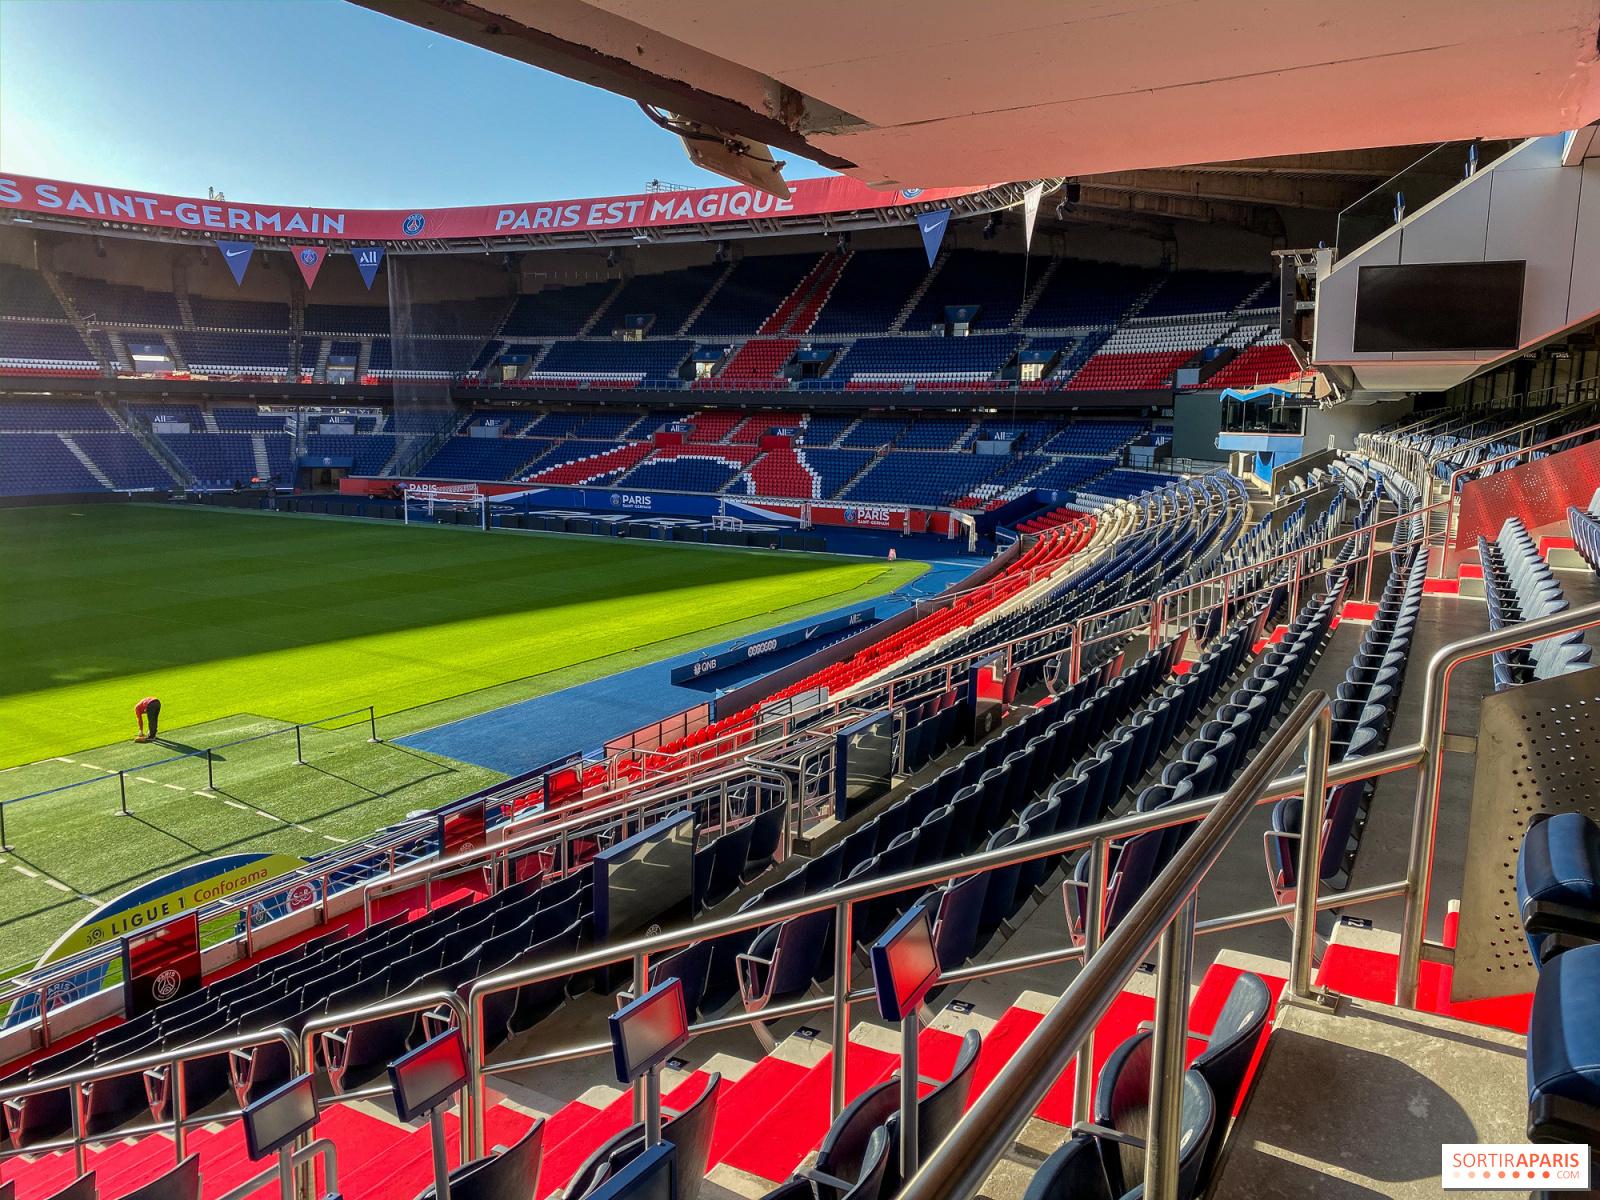 Psg Experience Exclusive Tour Of The Vip Area And The Galerie At Paris Parc Des Princes Stadium Sortiraparis Com